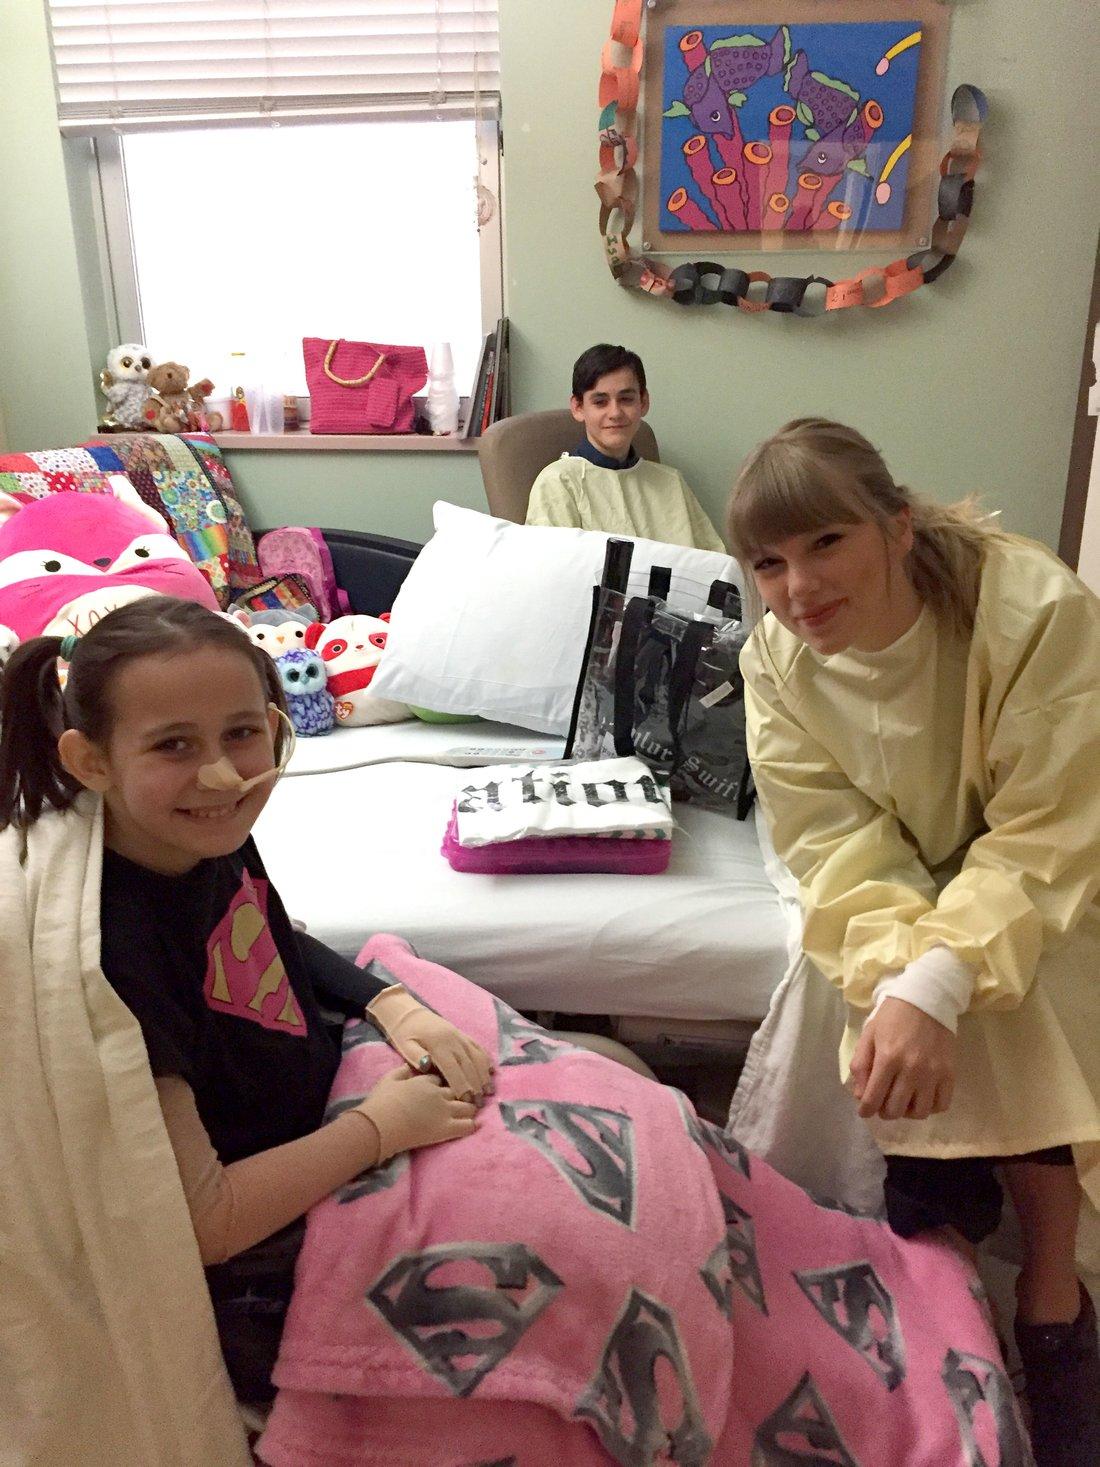 taylor swift visits hospital